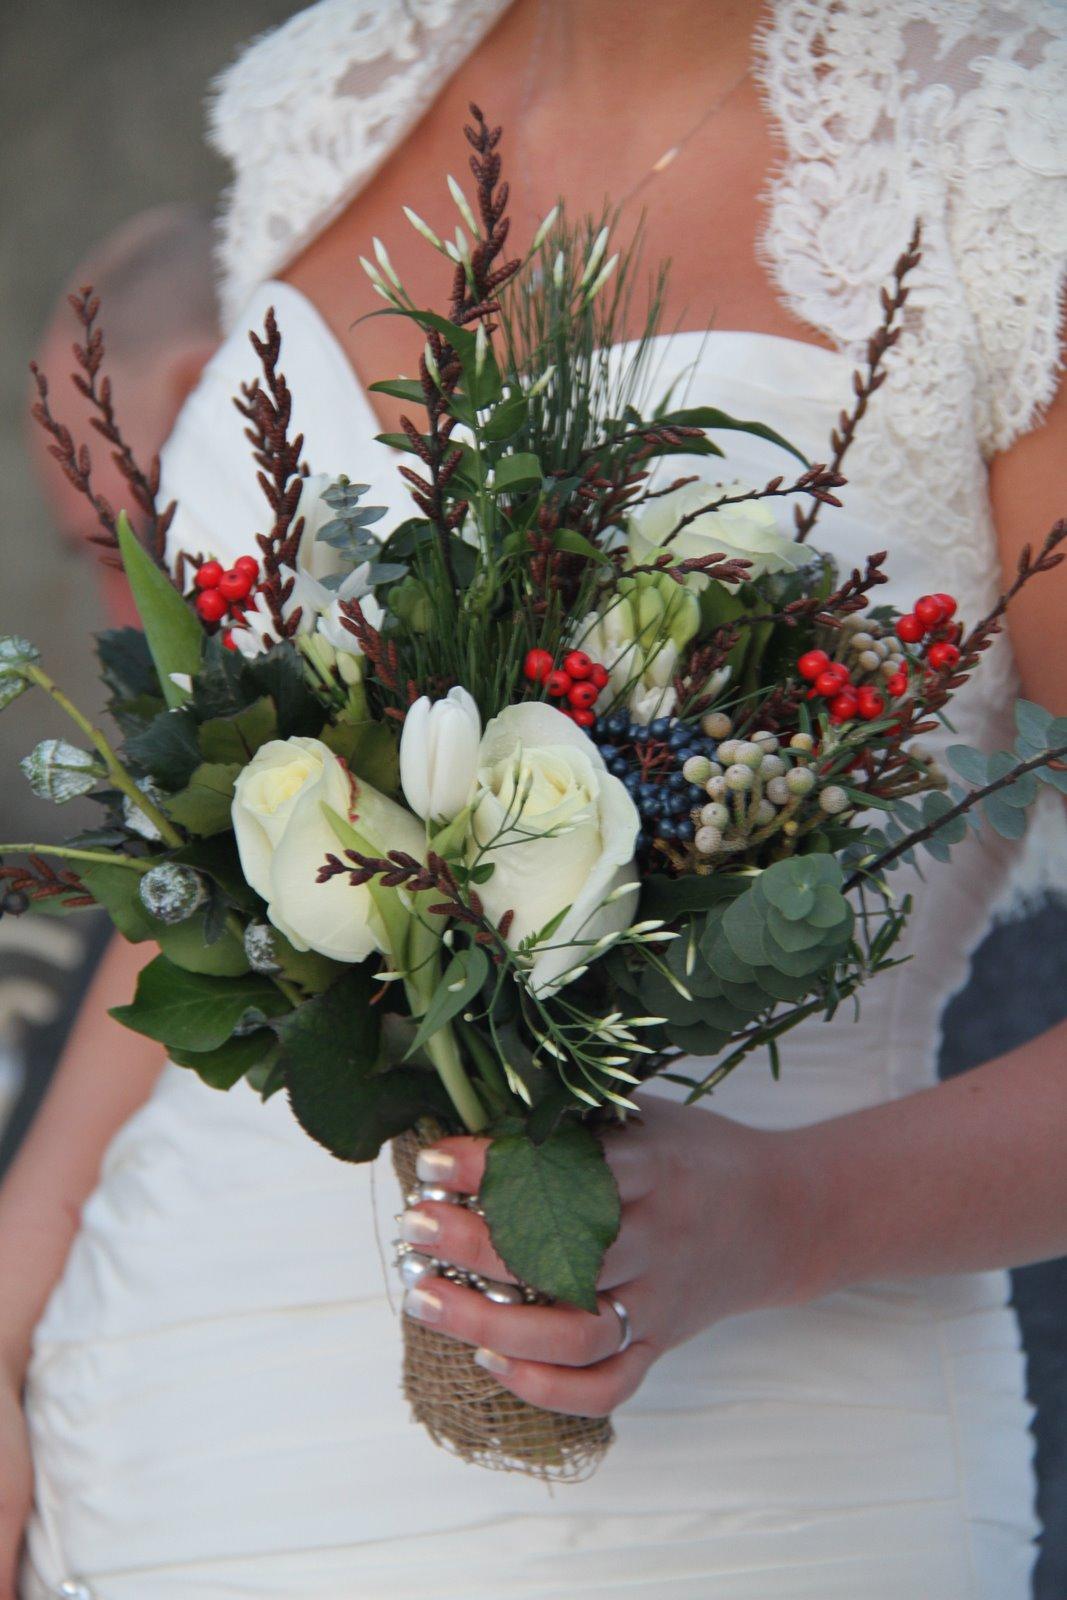 The Flower Magician: Winter Rustic Vintage Wedding Bouquet